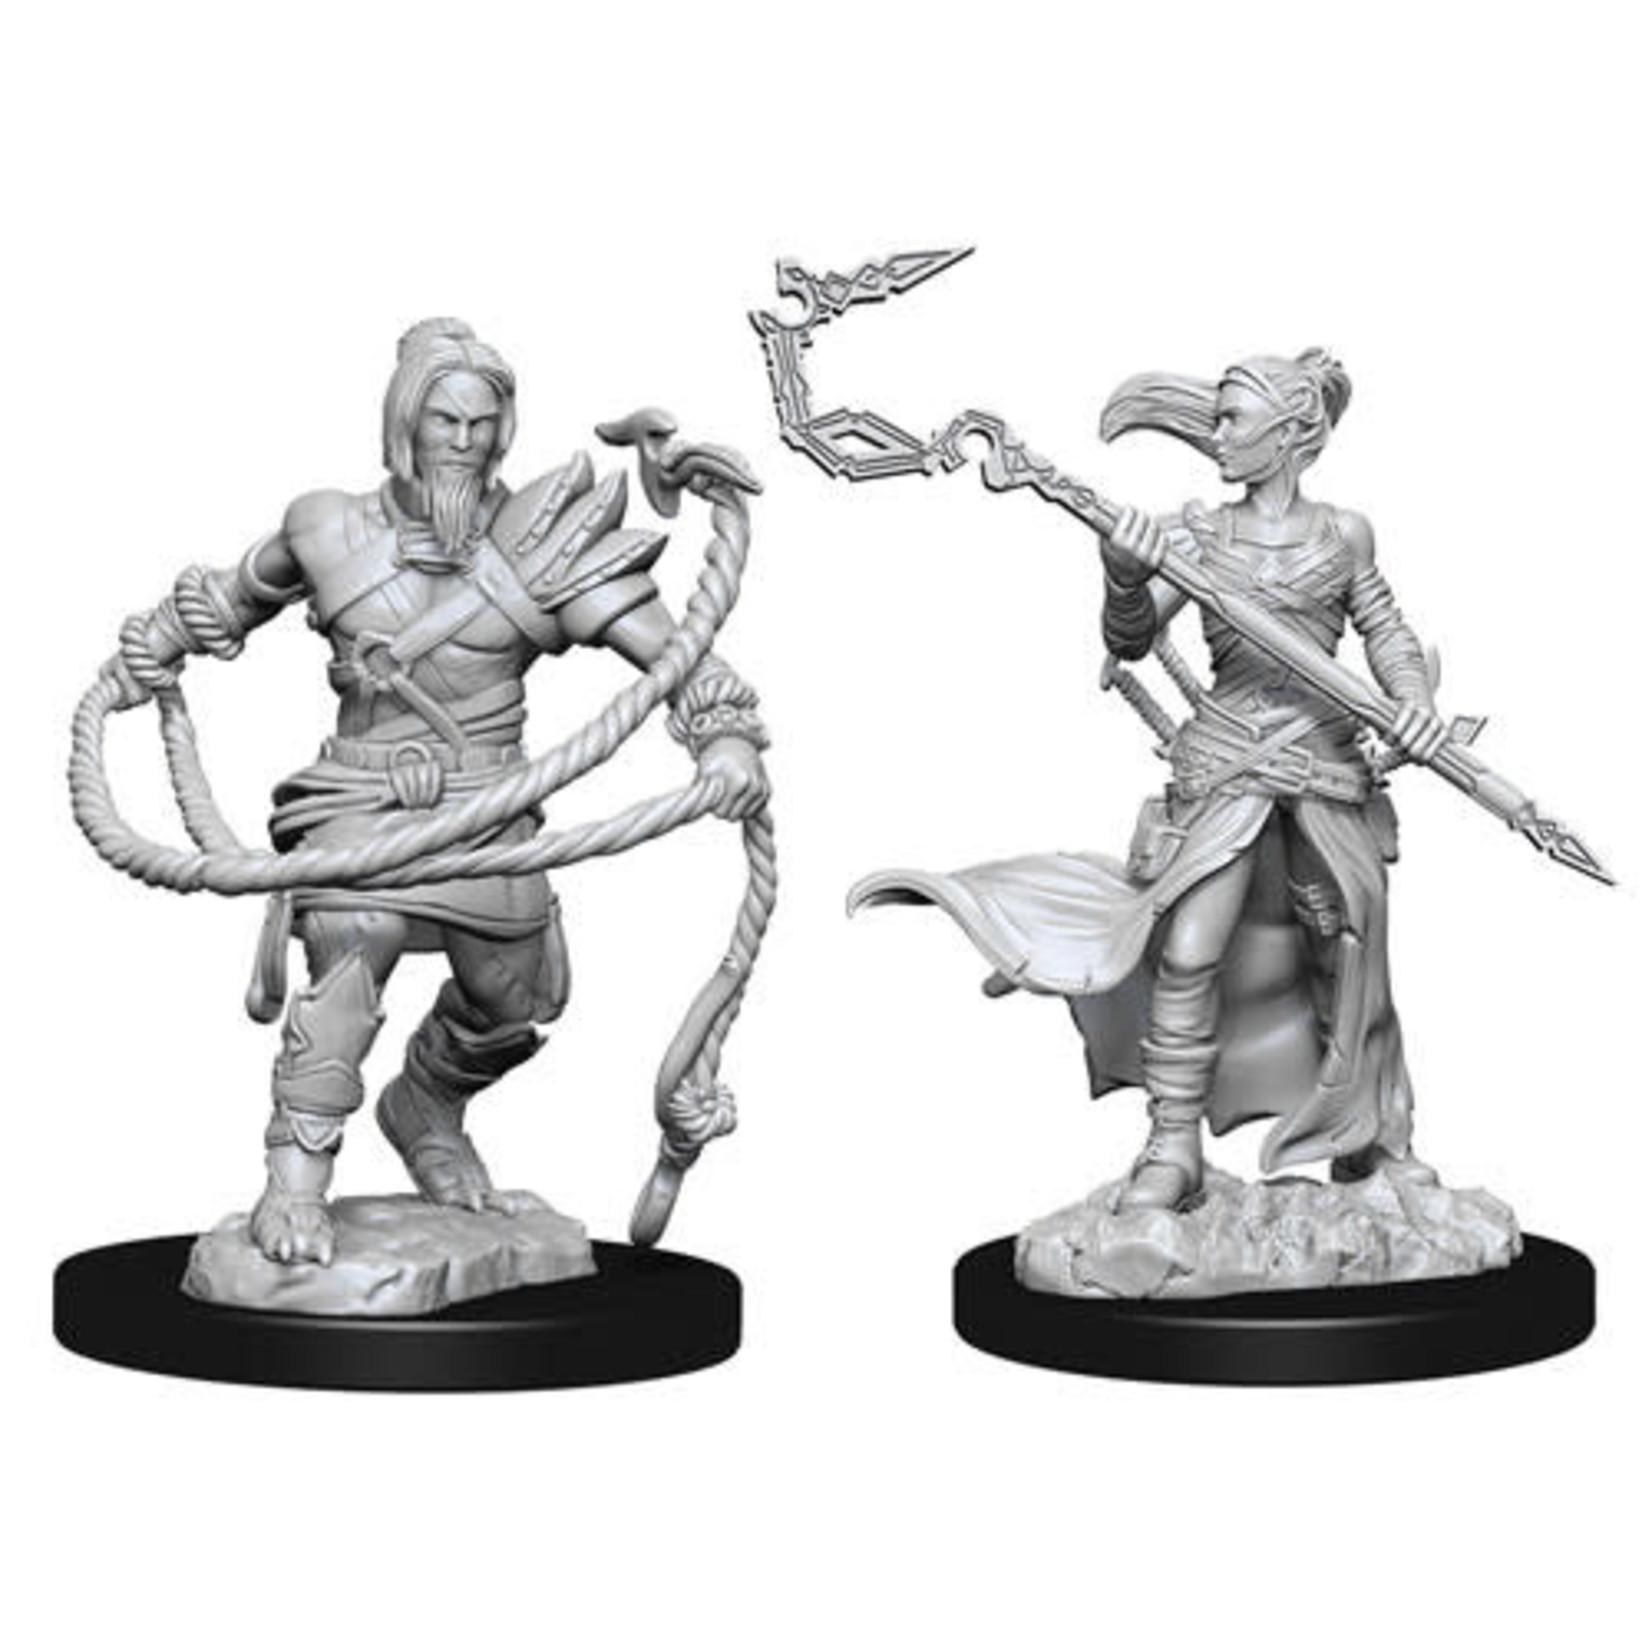 D&D Unpainted Minis: Stoneforge Mystic & Kor Hookermaster (Wave 13)